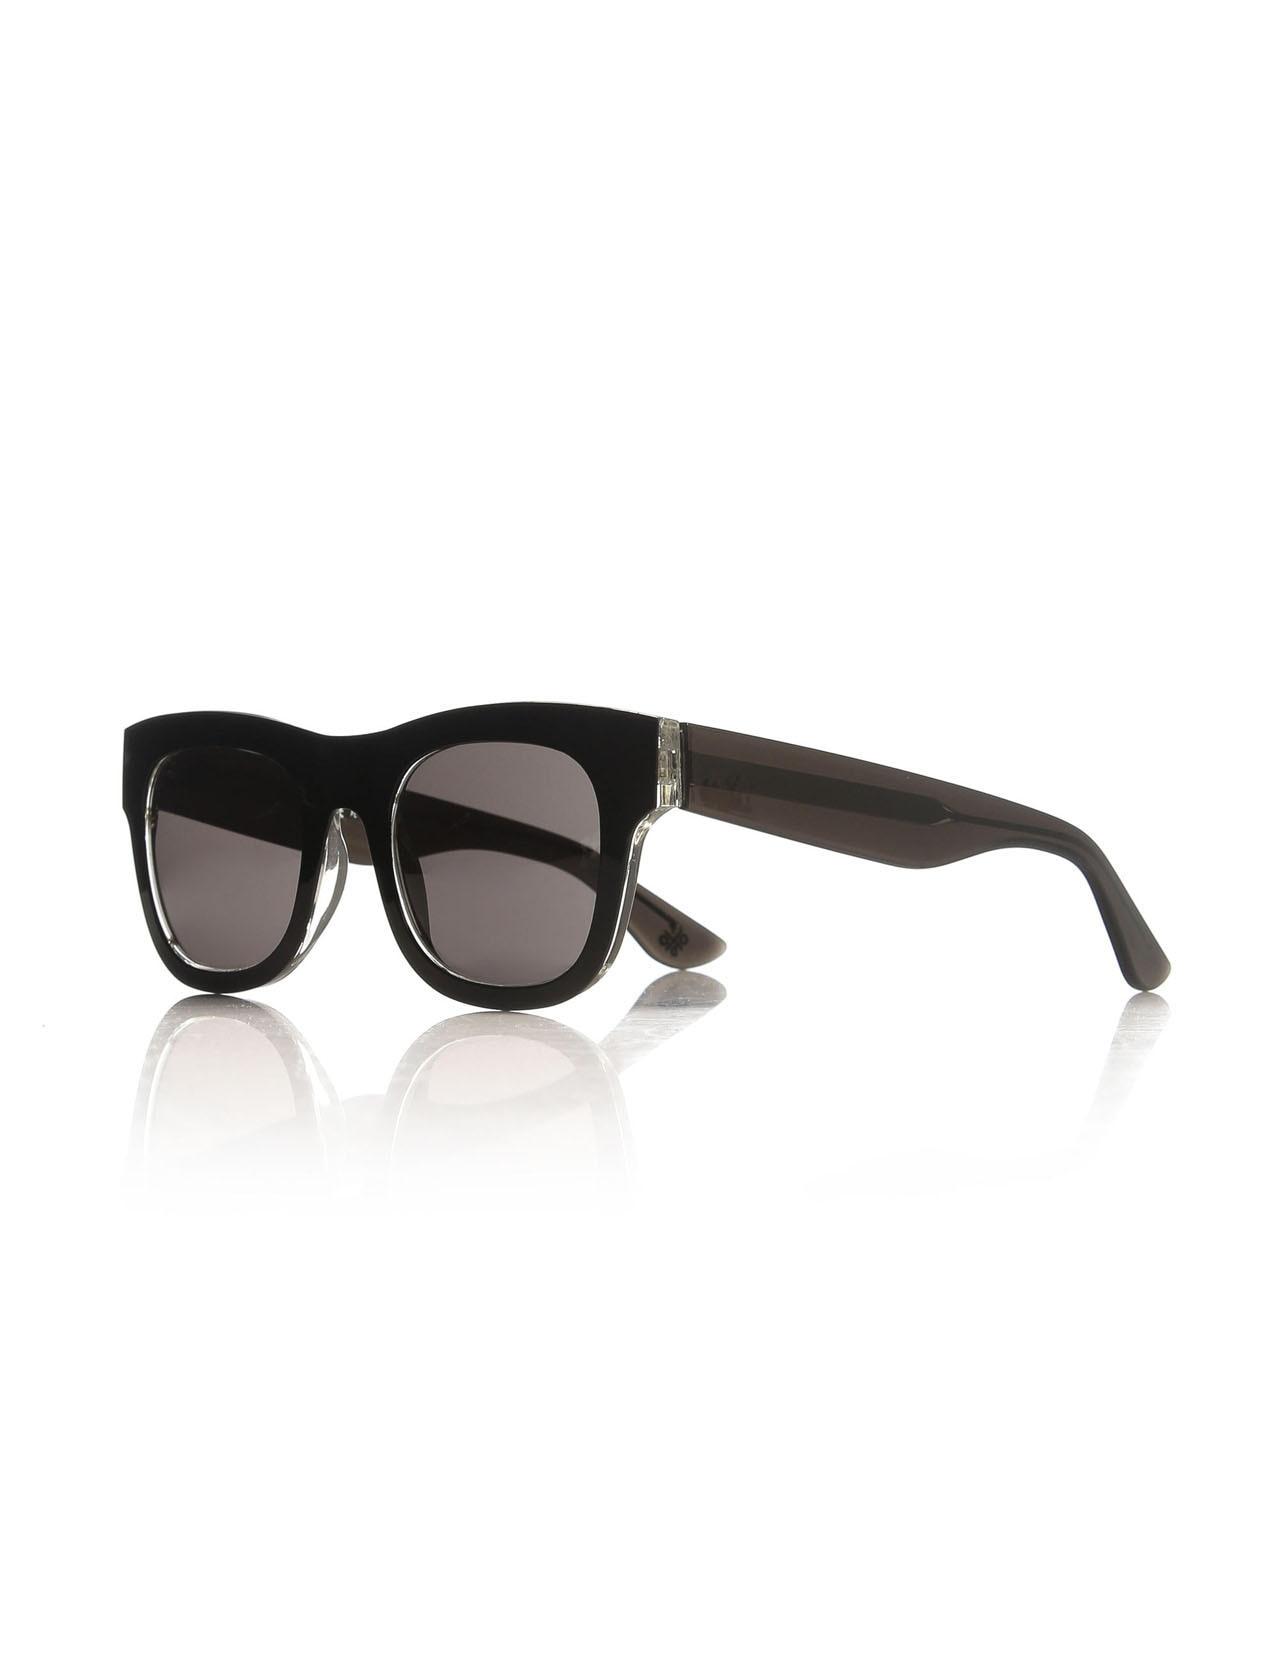 Unisex sunglasses ox 1087/s cc0 50 nr bone black organic square square 50-22-145 oxydo